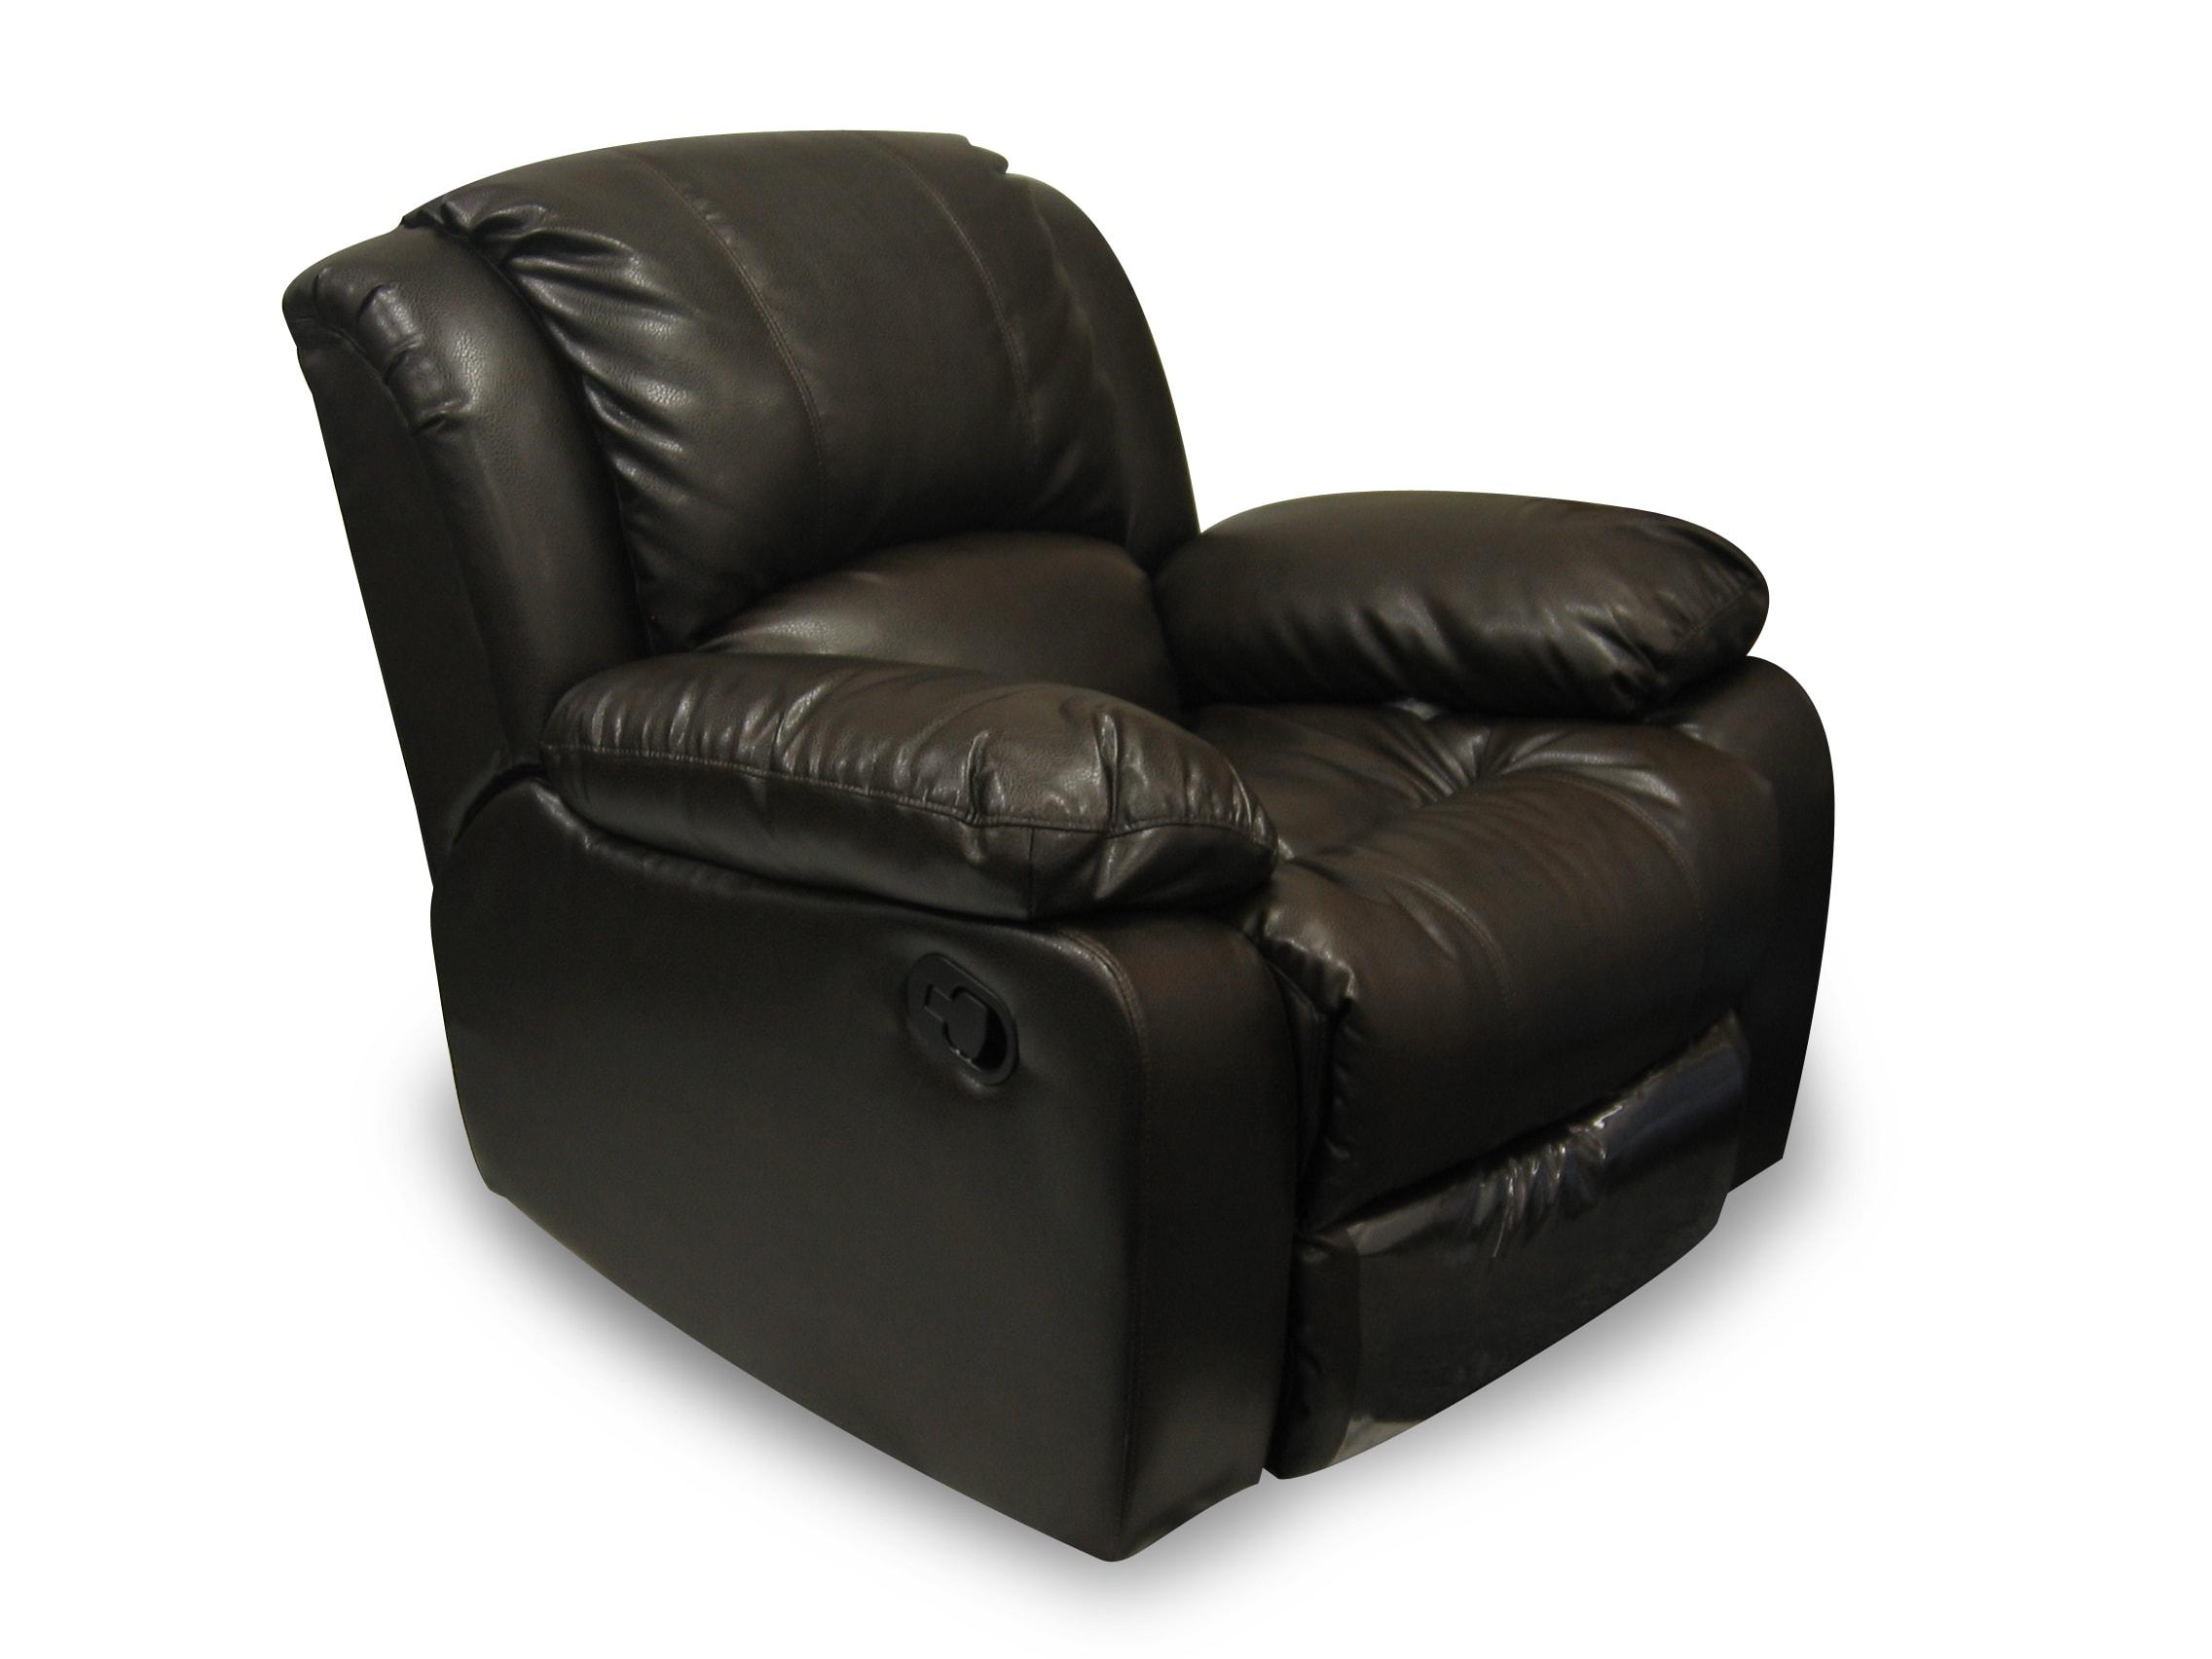 Thumbnail 2, Bridgeport Bonded Leather 'Motion' Recliner Chair. Changes active main hero.